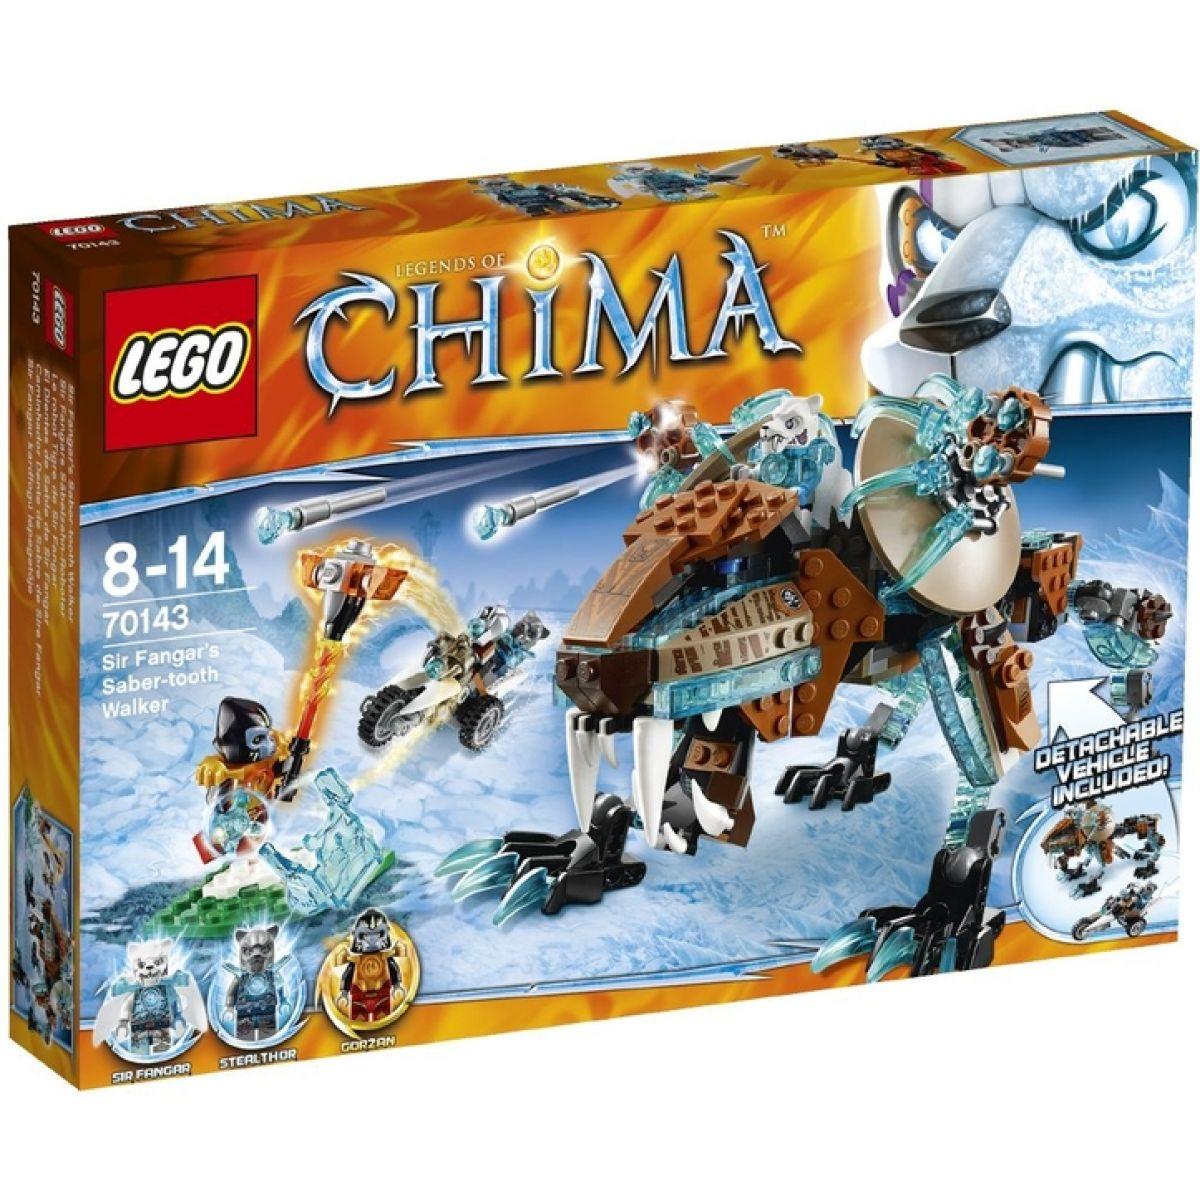 LEGO Chima 70143 Šavlozubý robot sira Fangara